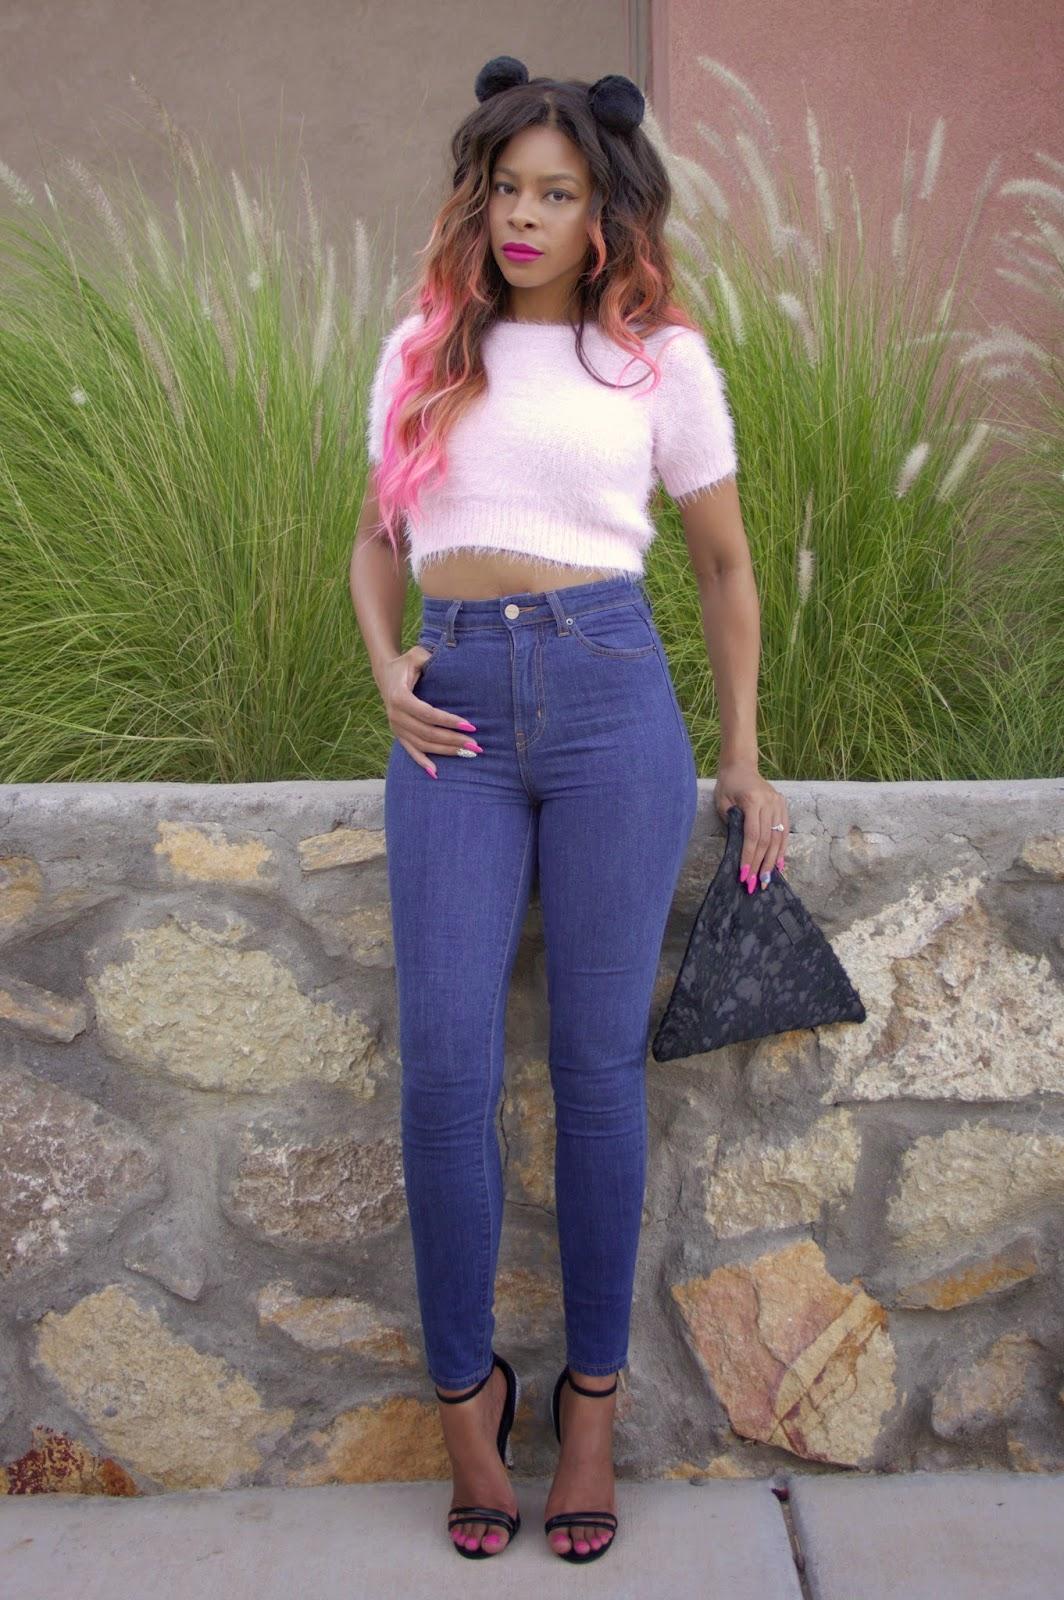 nasty gal denim kink jeans #pinkhair allthingsslim